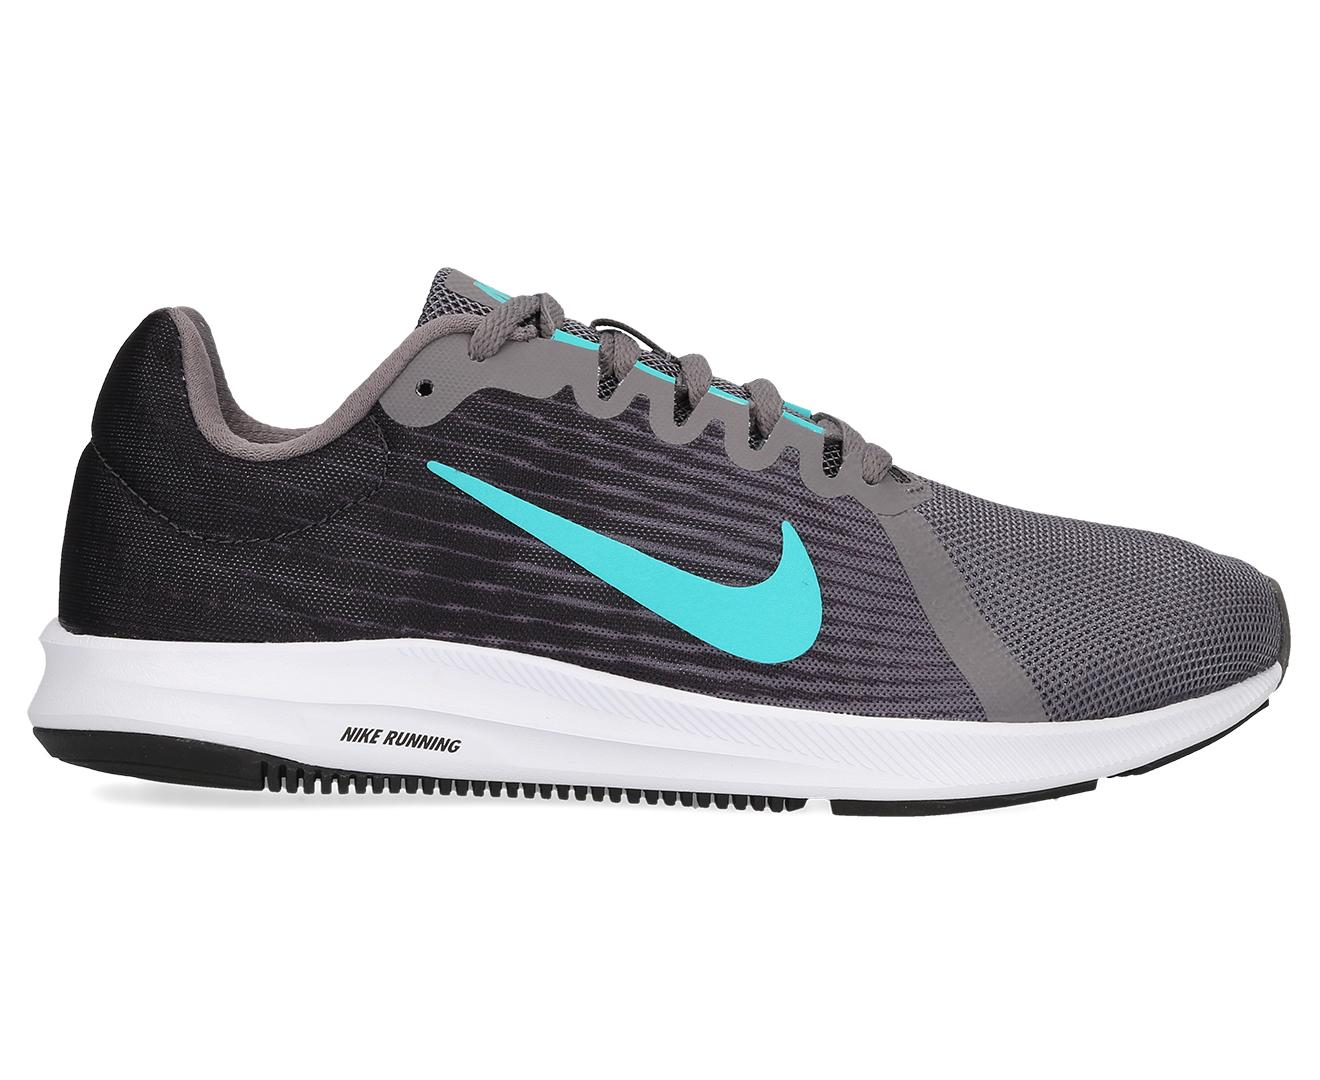 6887187326bd7 Details about Nike Women's Downshifter 8 Shoe - Gunsmoke/Hyper Jade-Oil Grey